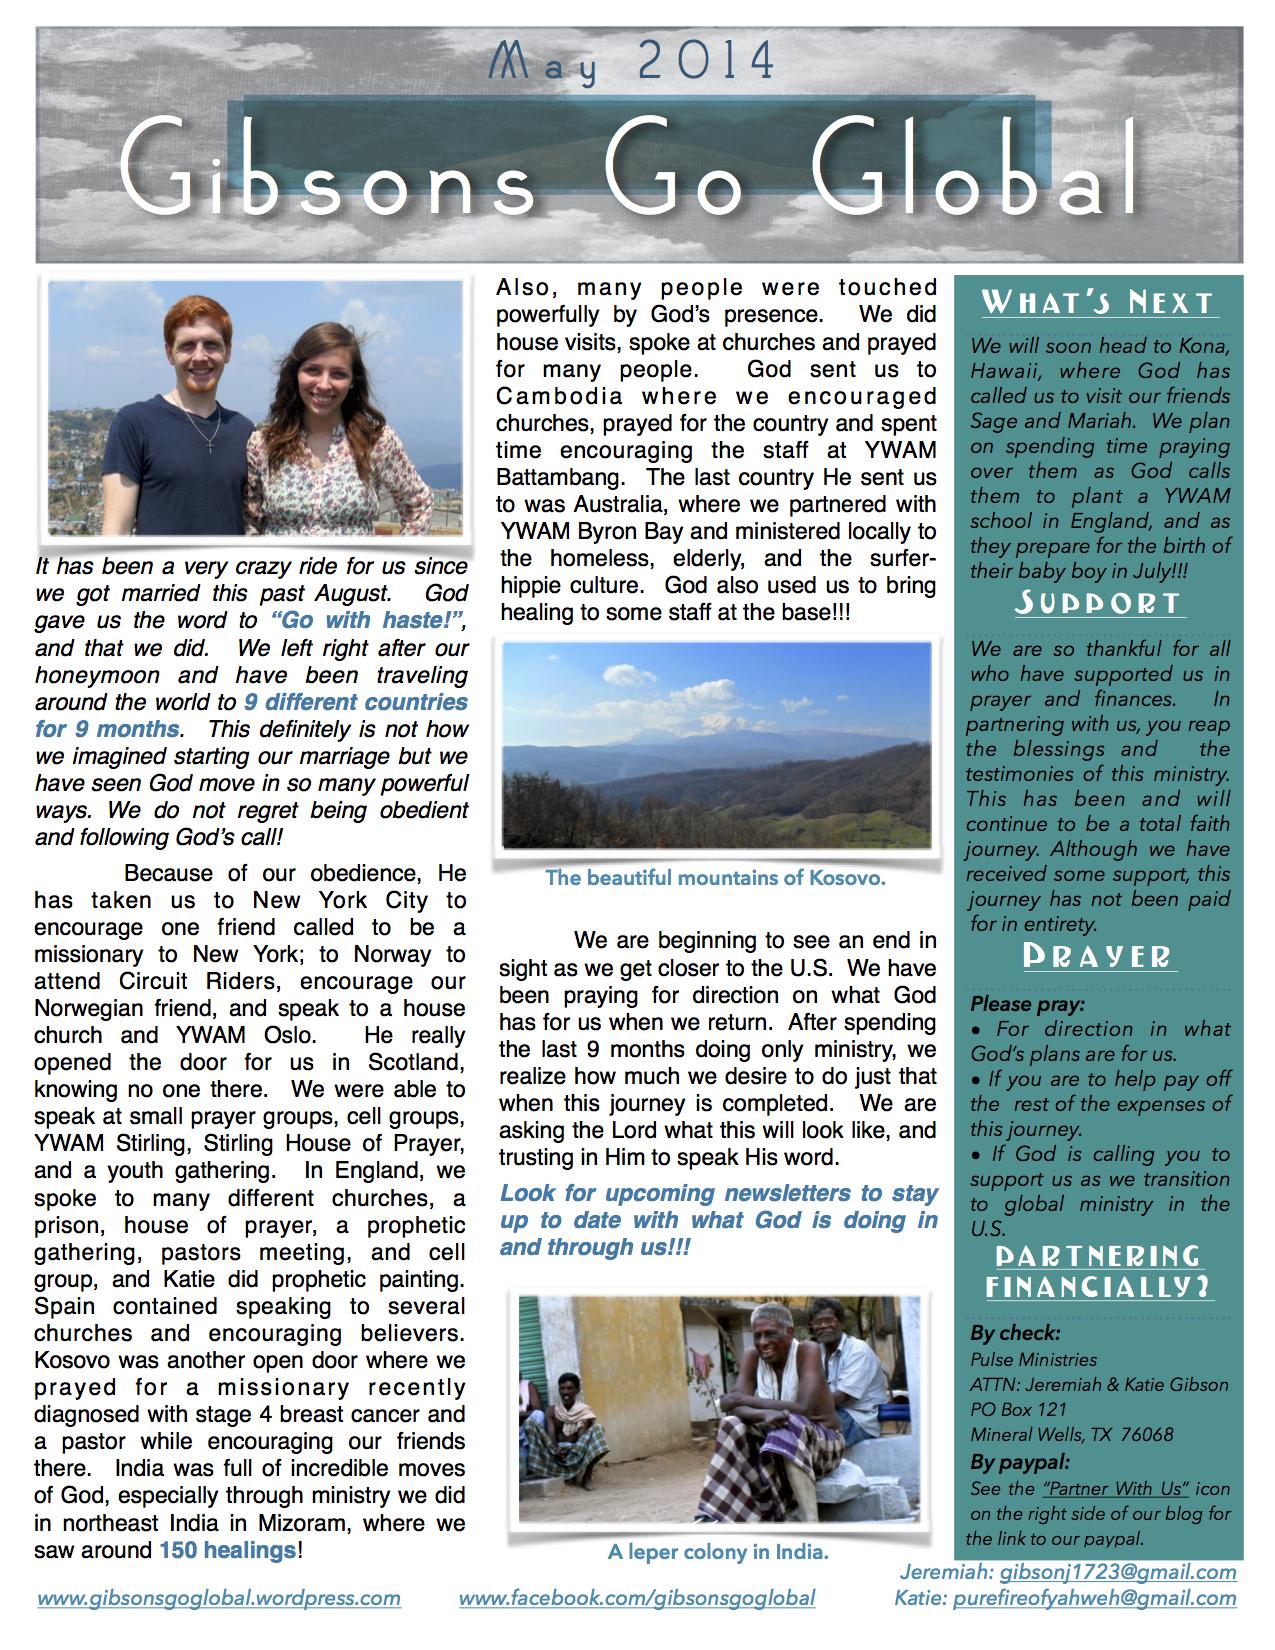 Battambang | Gibsons Go Global